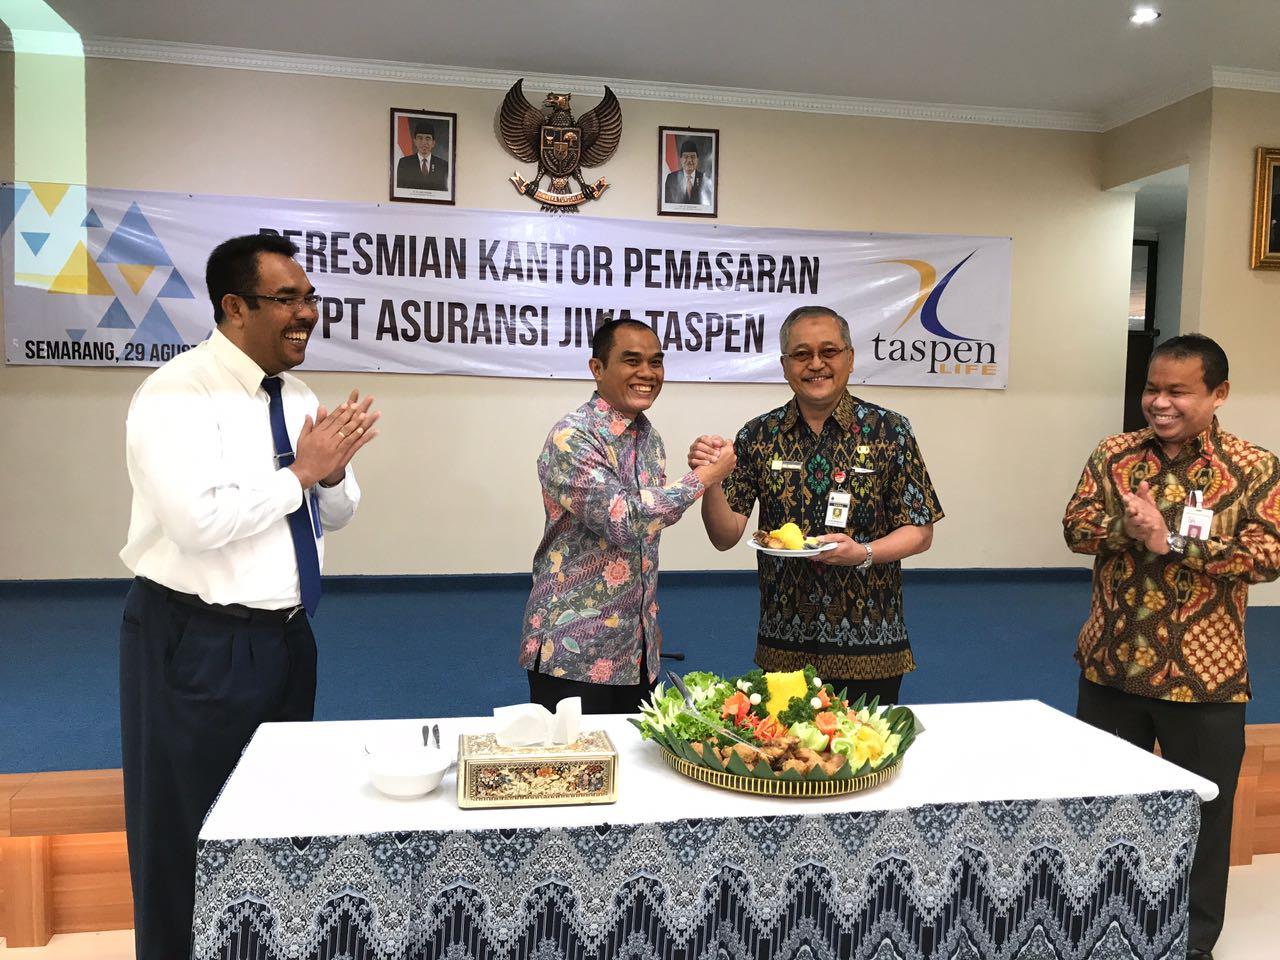 Taspen Life Resmi Buka Kantor Pemasaran di Semarang